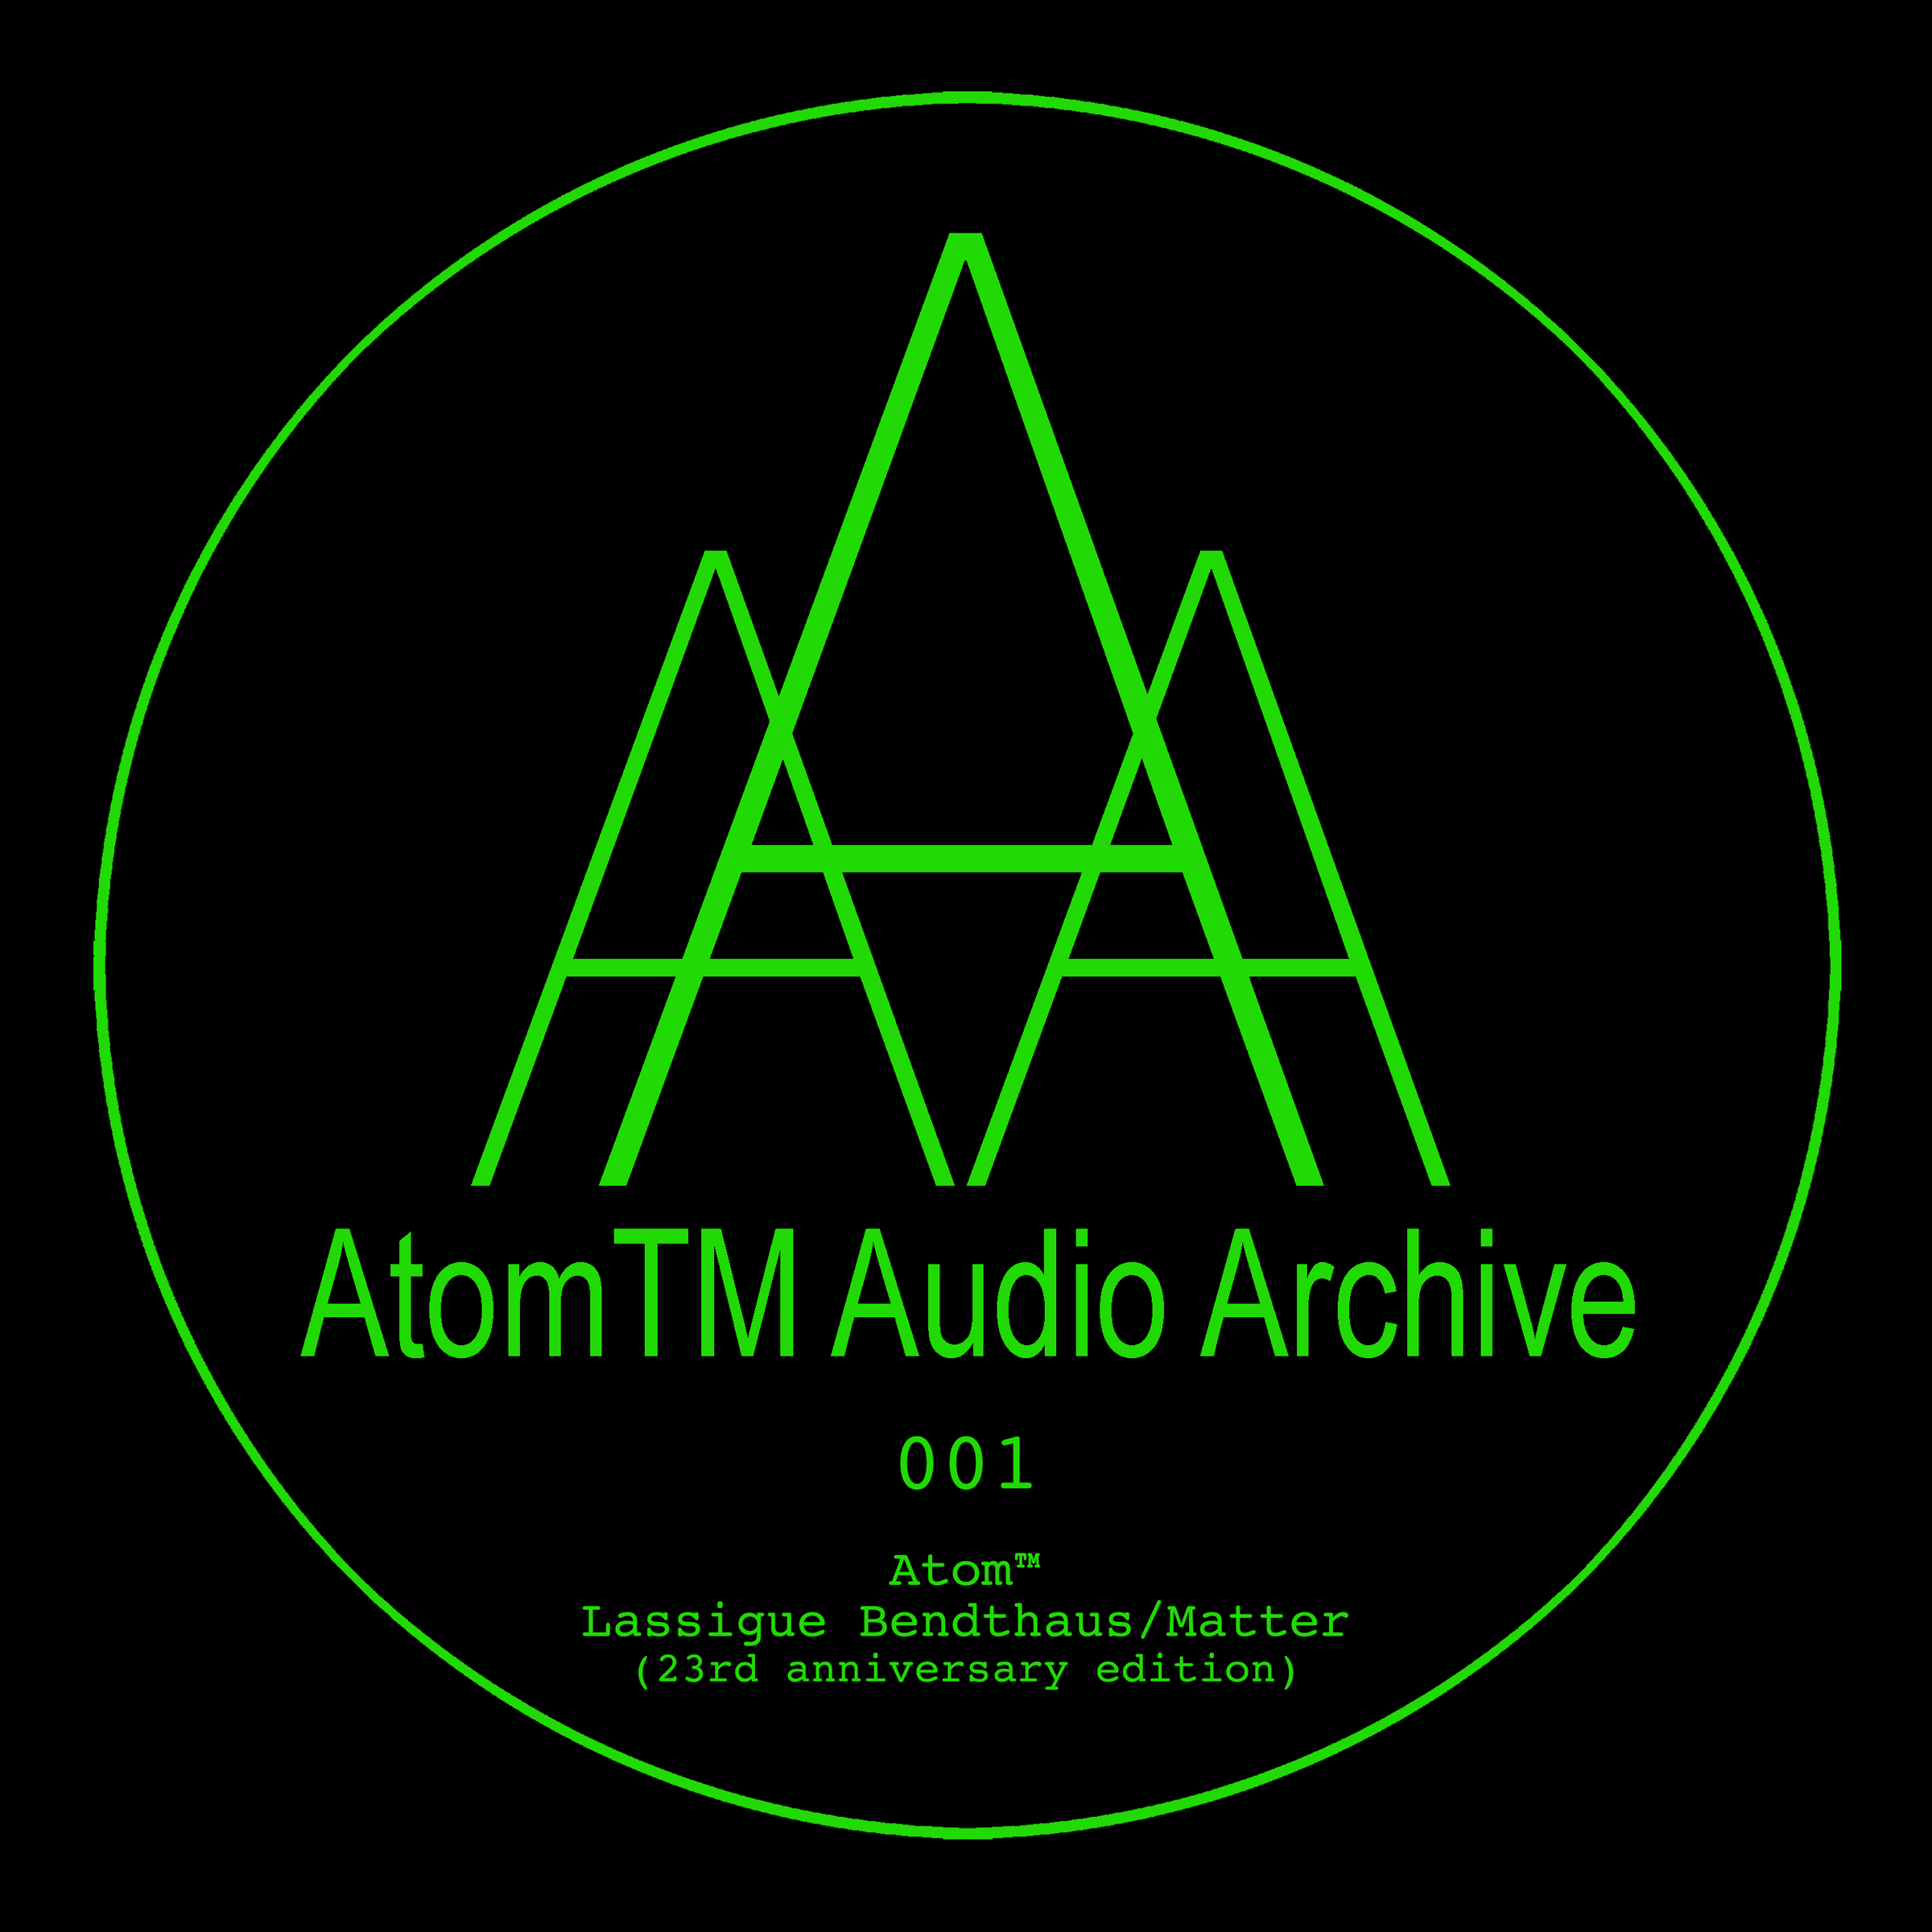 AtomTM – Lassigue Bendthaus/Matter (23rd Anniversary Edition) (AtomTM_Audio_Archive)